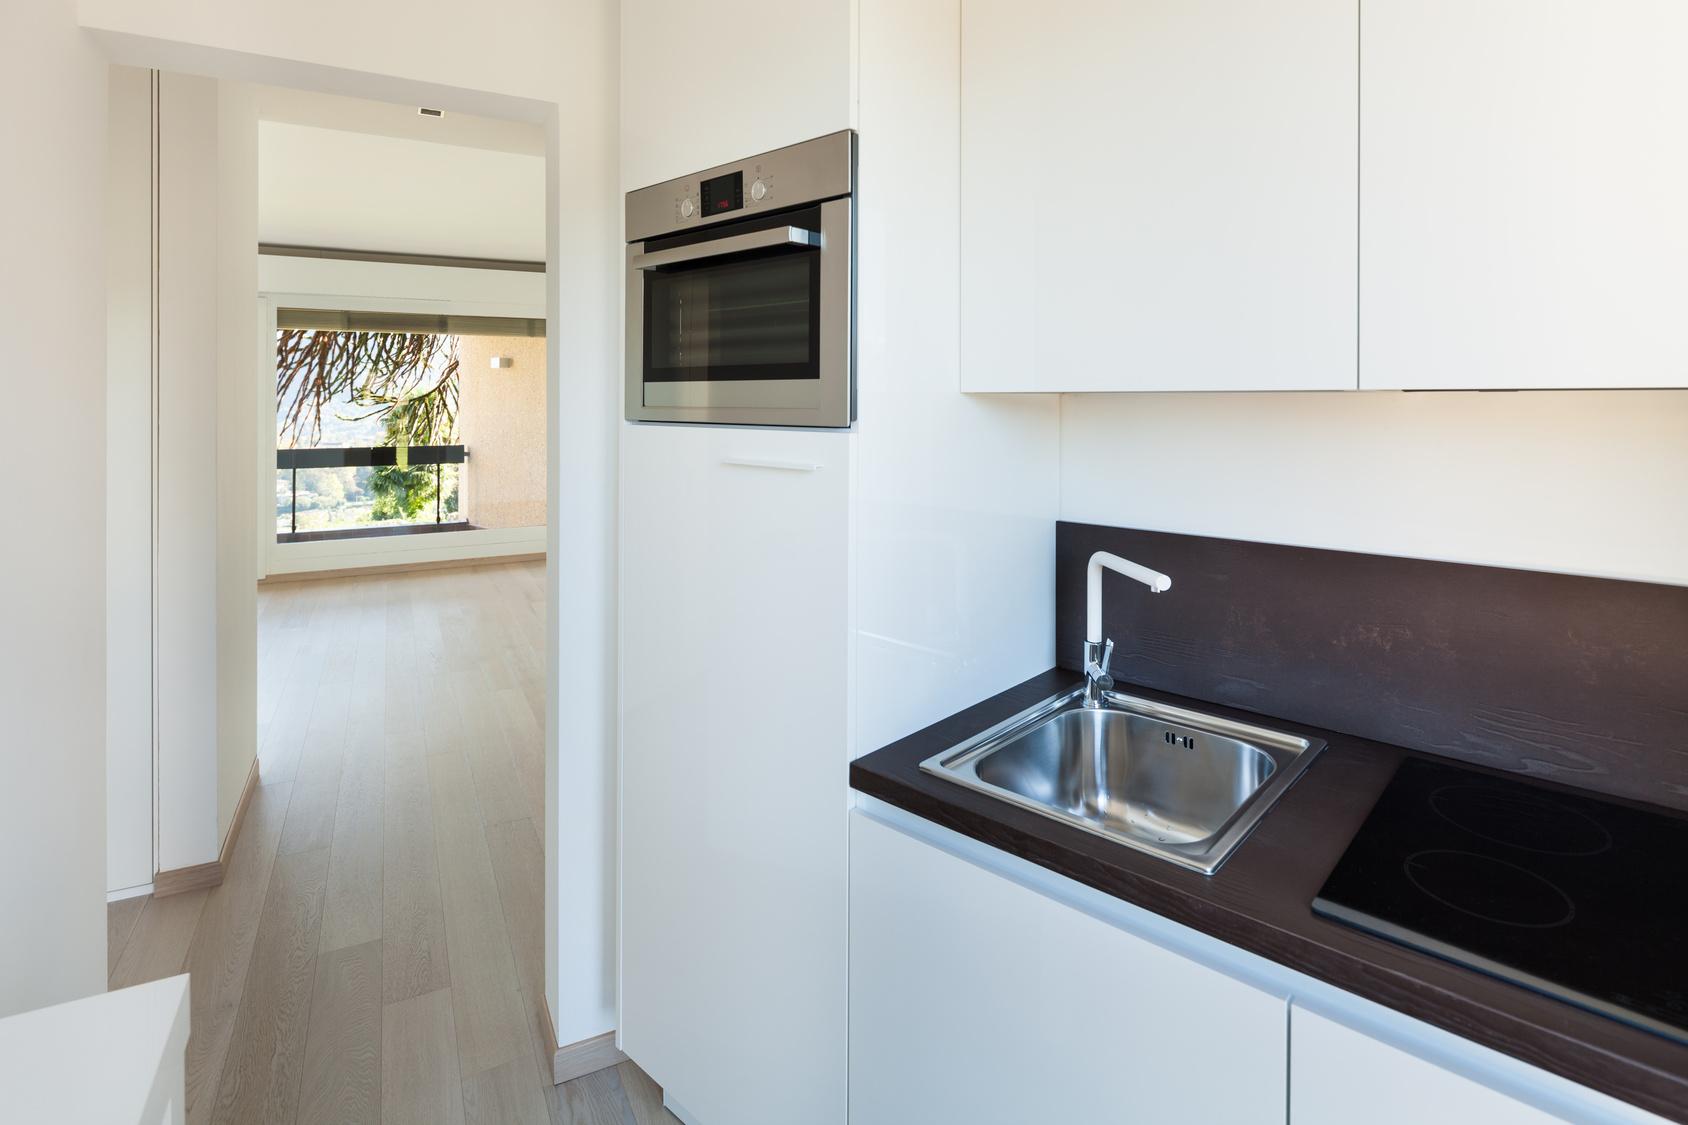 Full Size of Interiors Building, Modern Apartment, Kitchen View Küche Singleküche